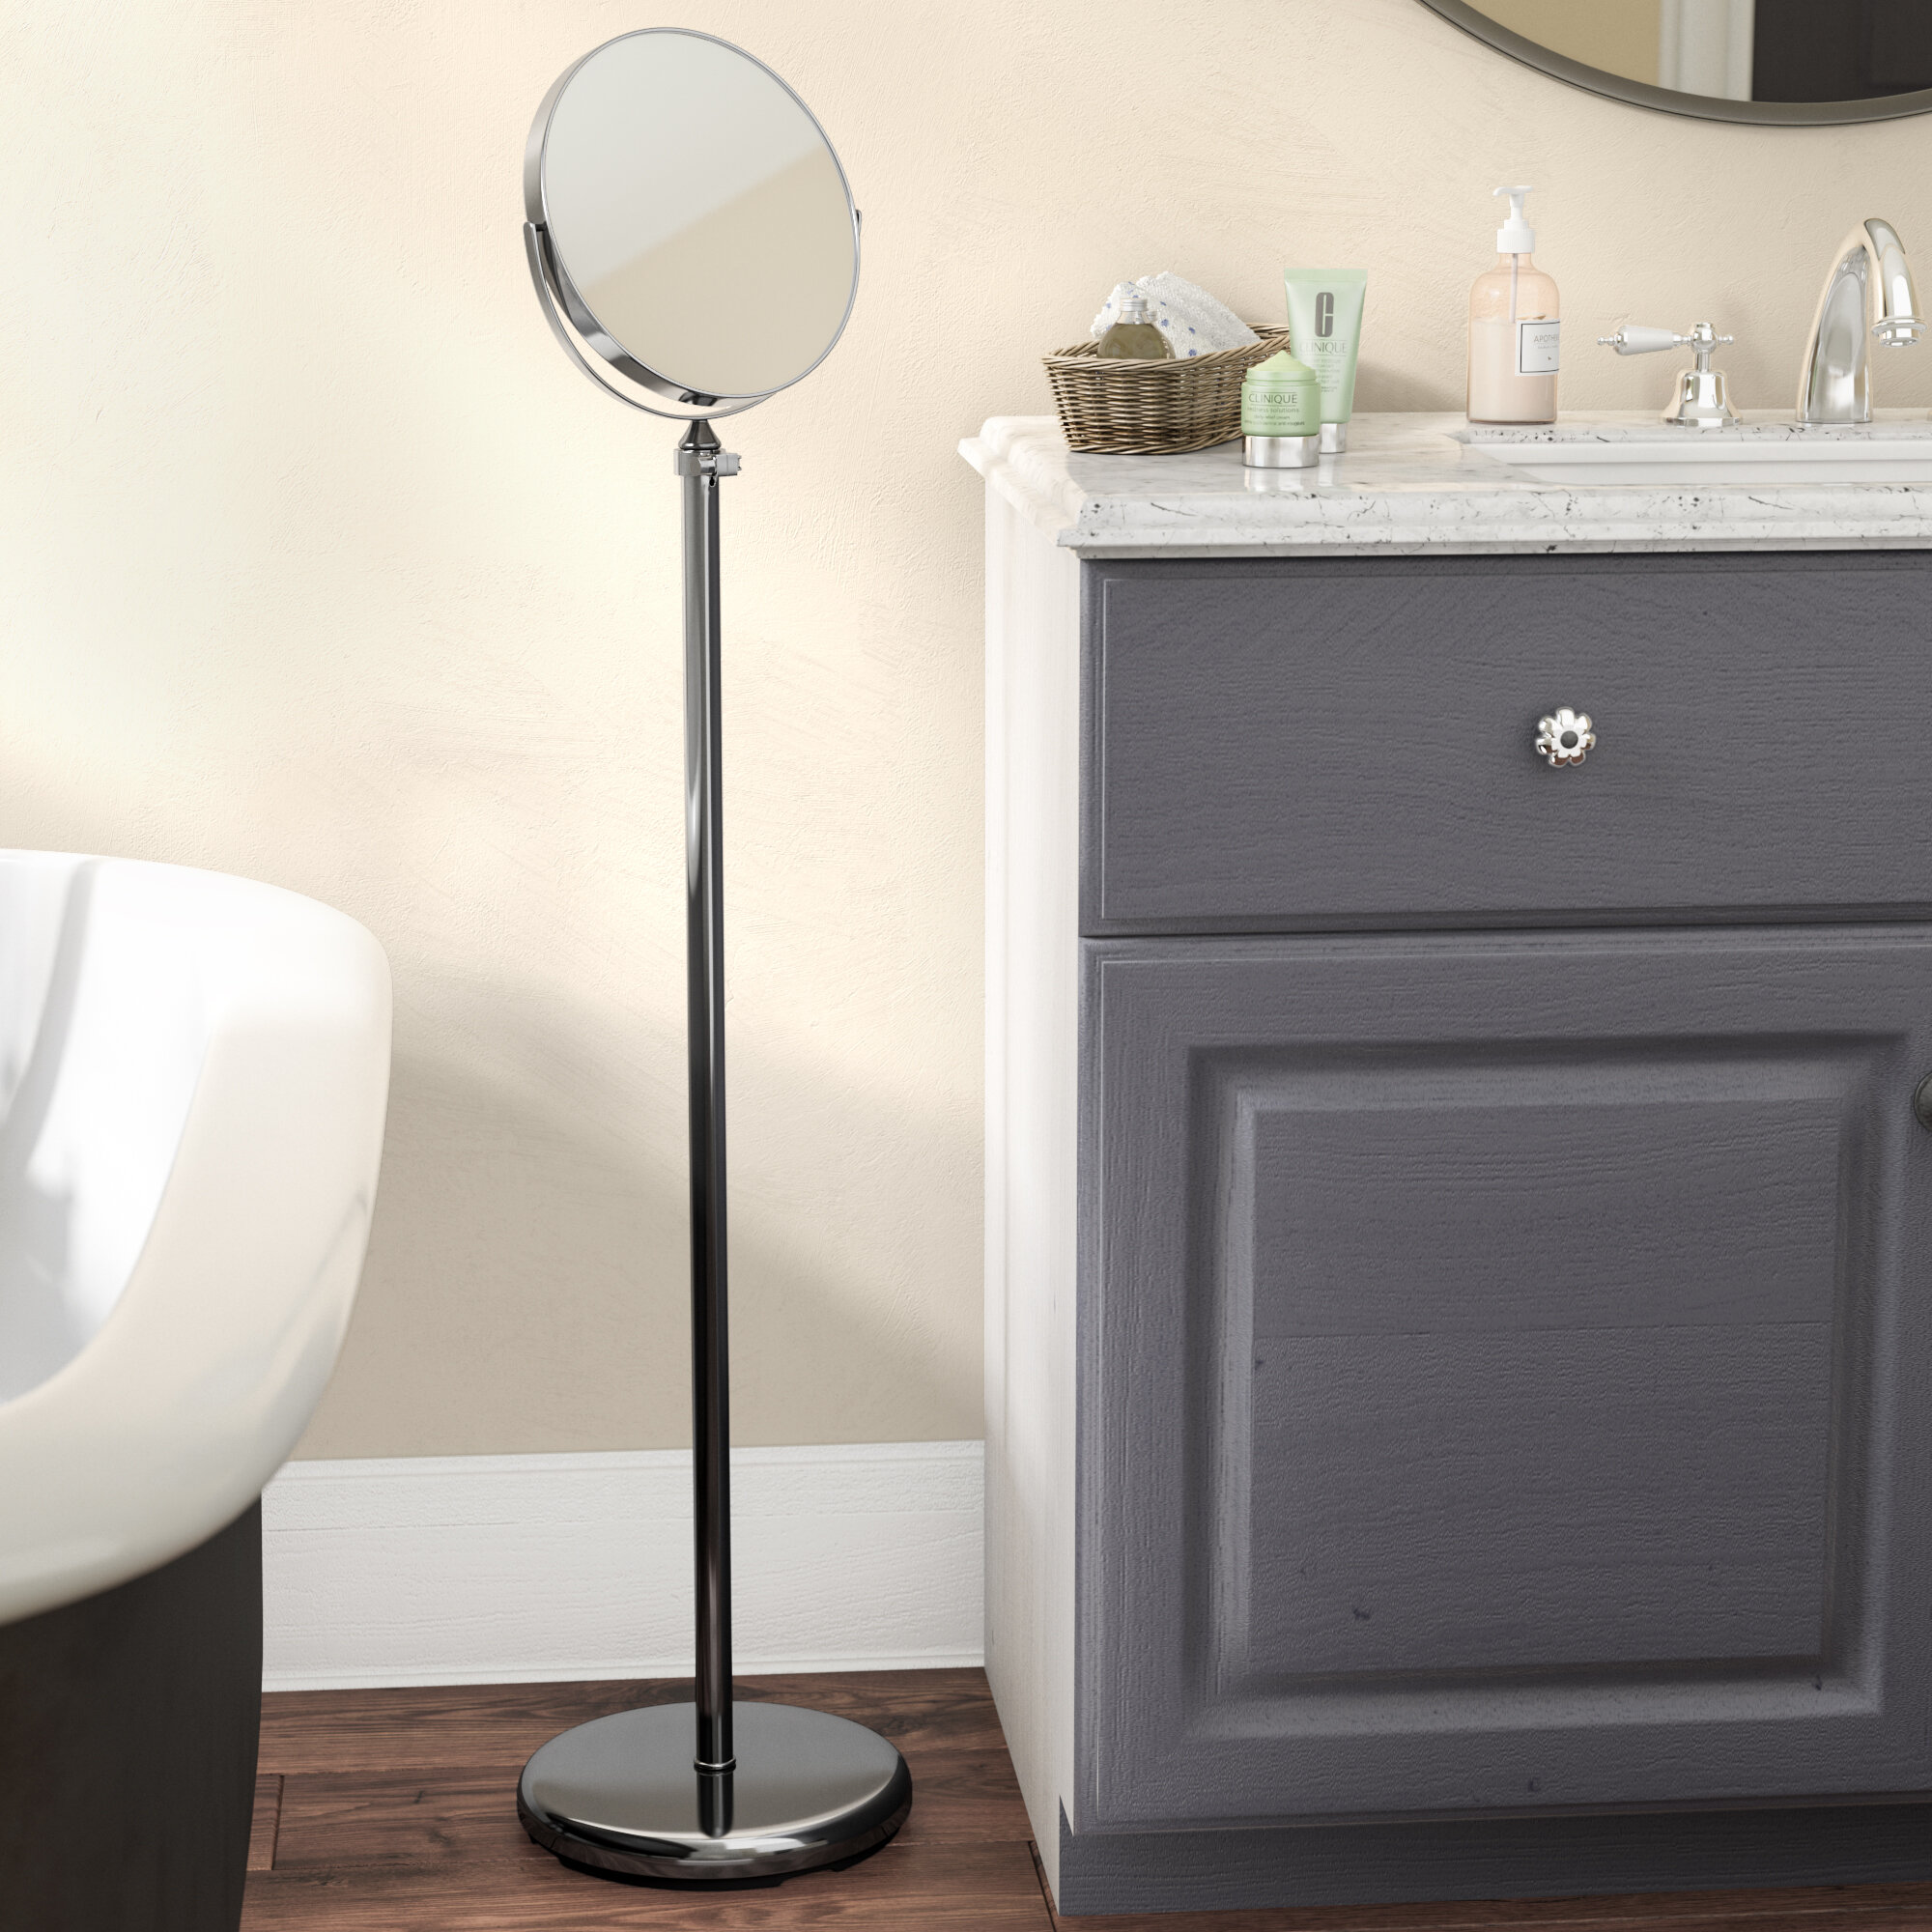 Andover Mills Adjustable Standing Full Length Mirror & Reviews | Wayfair